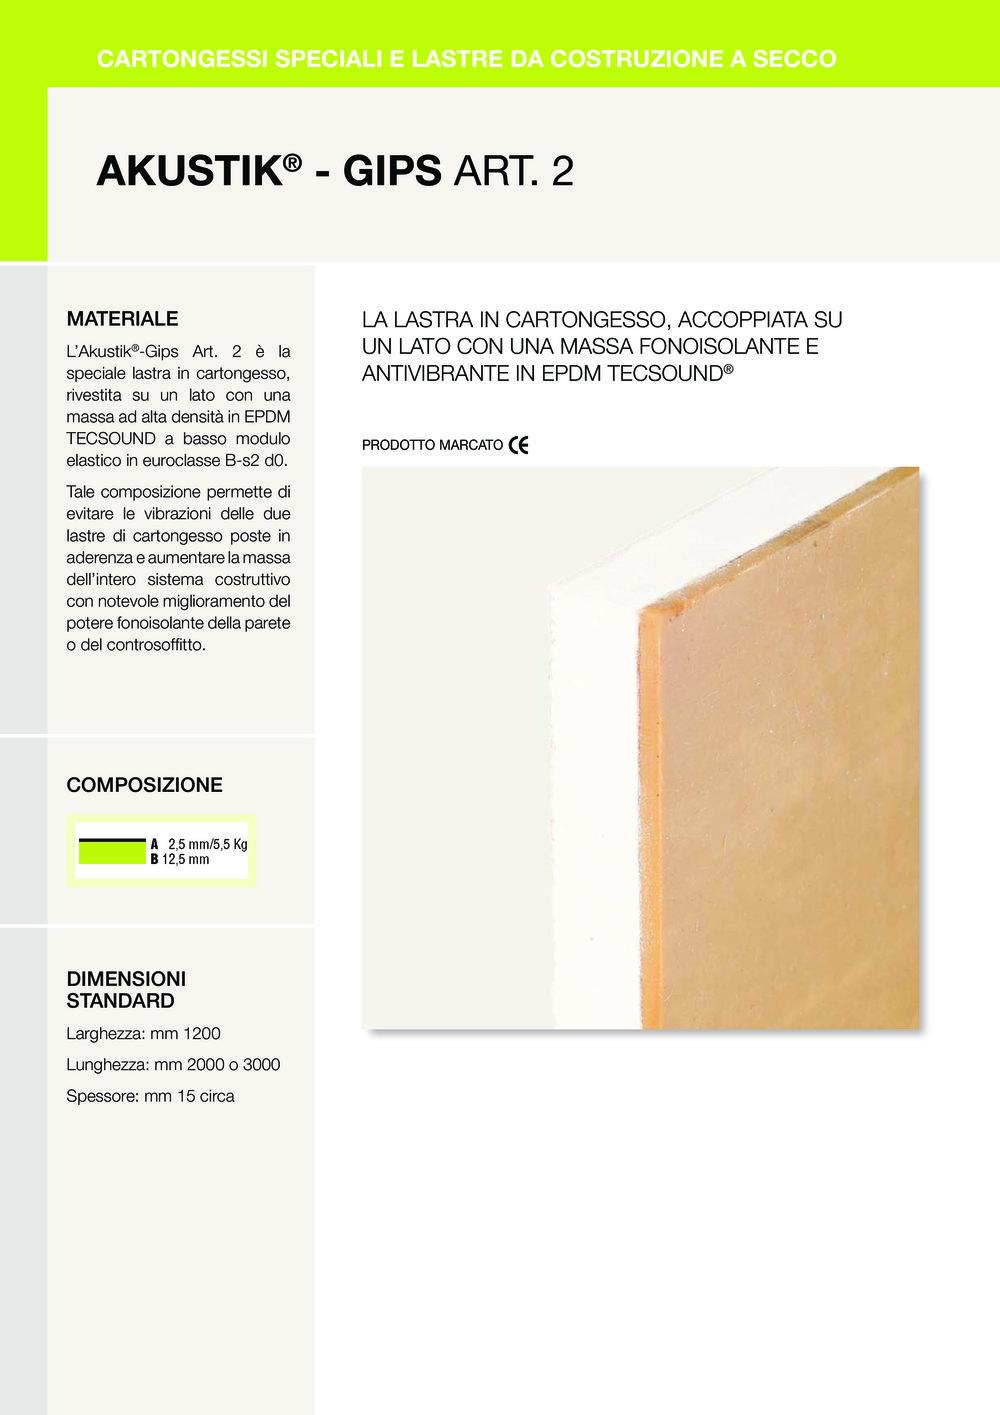 AKUSTIK ® - GIPS ART. 2